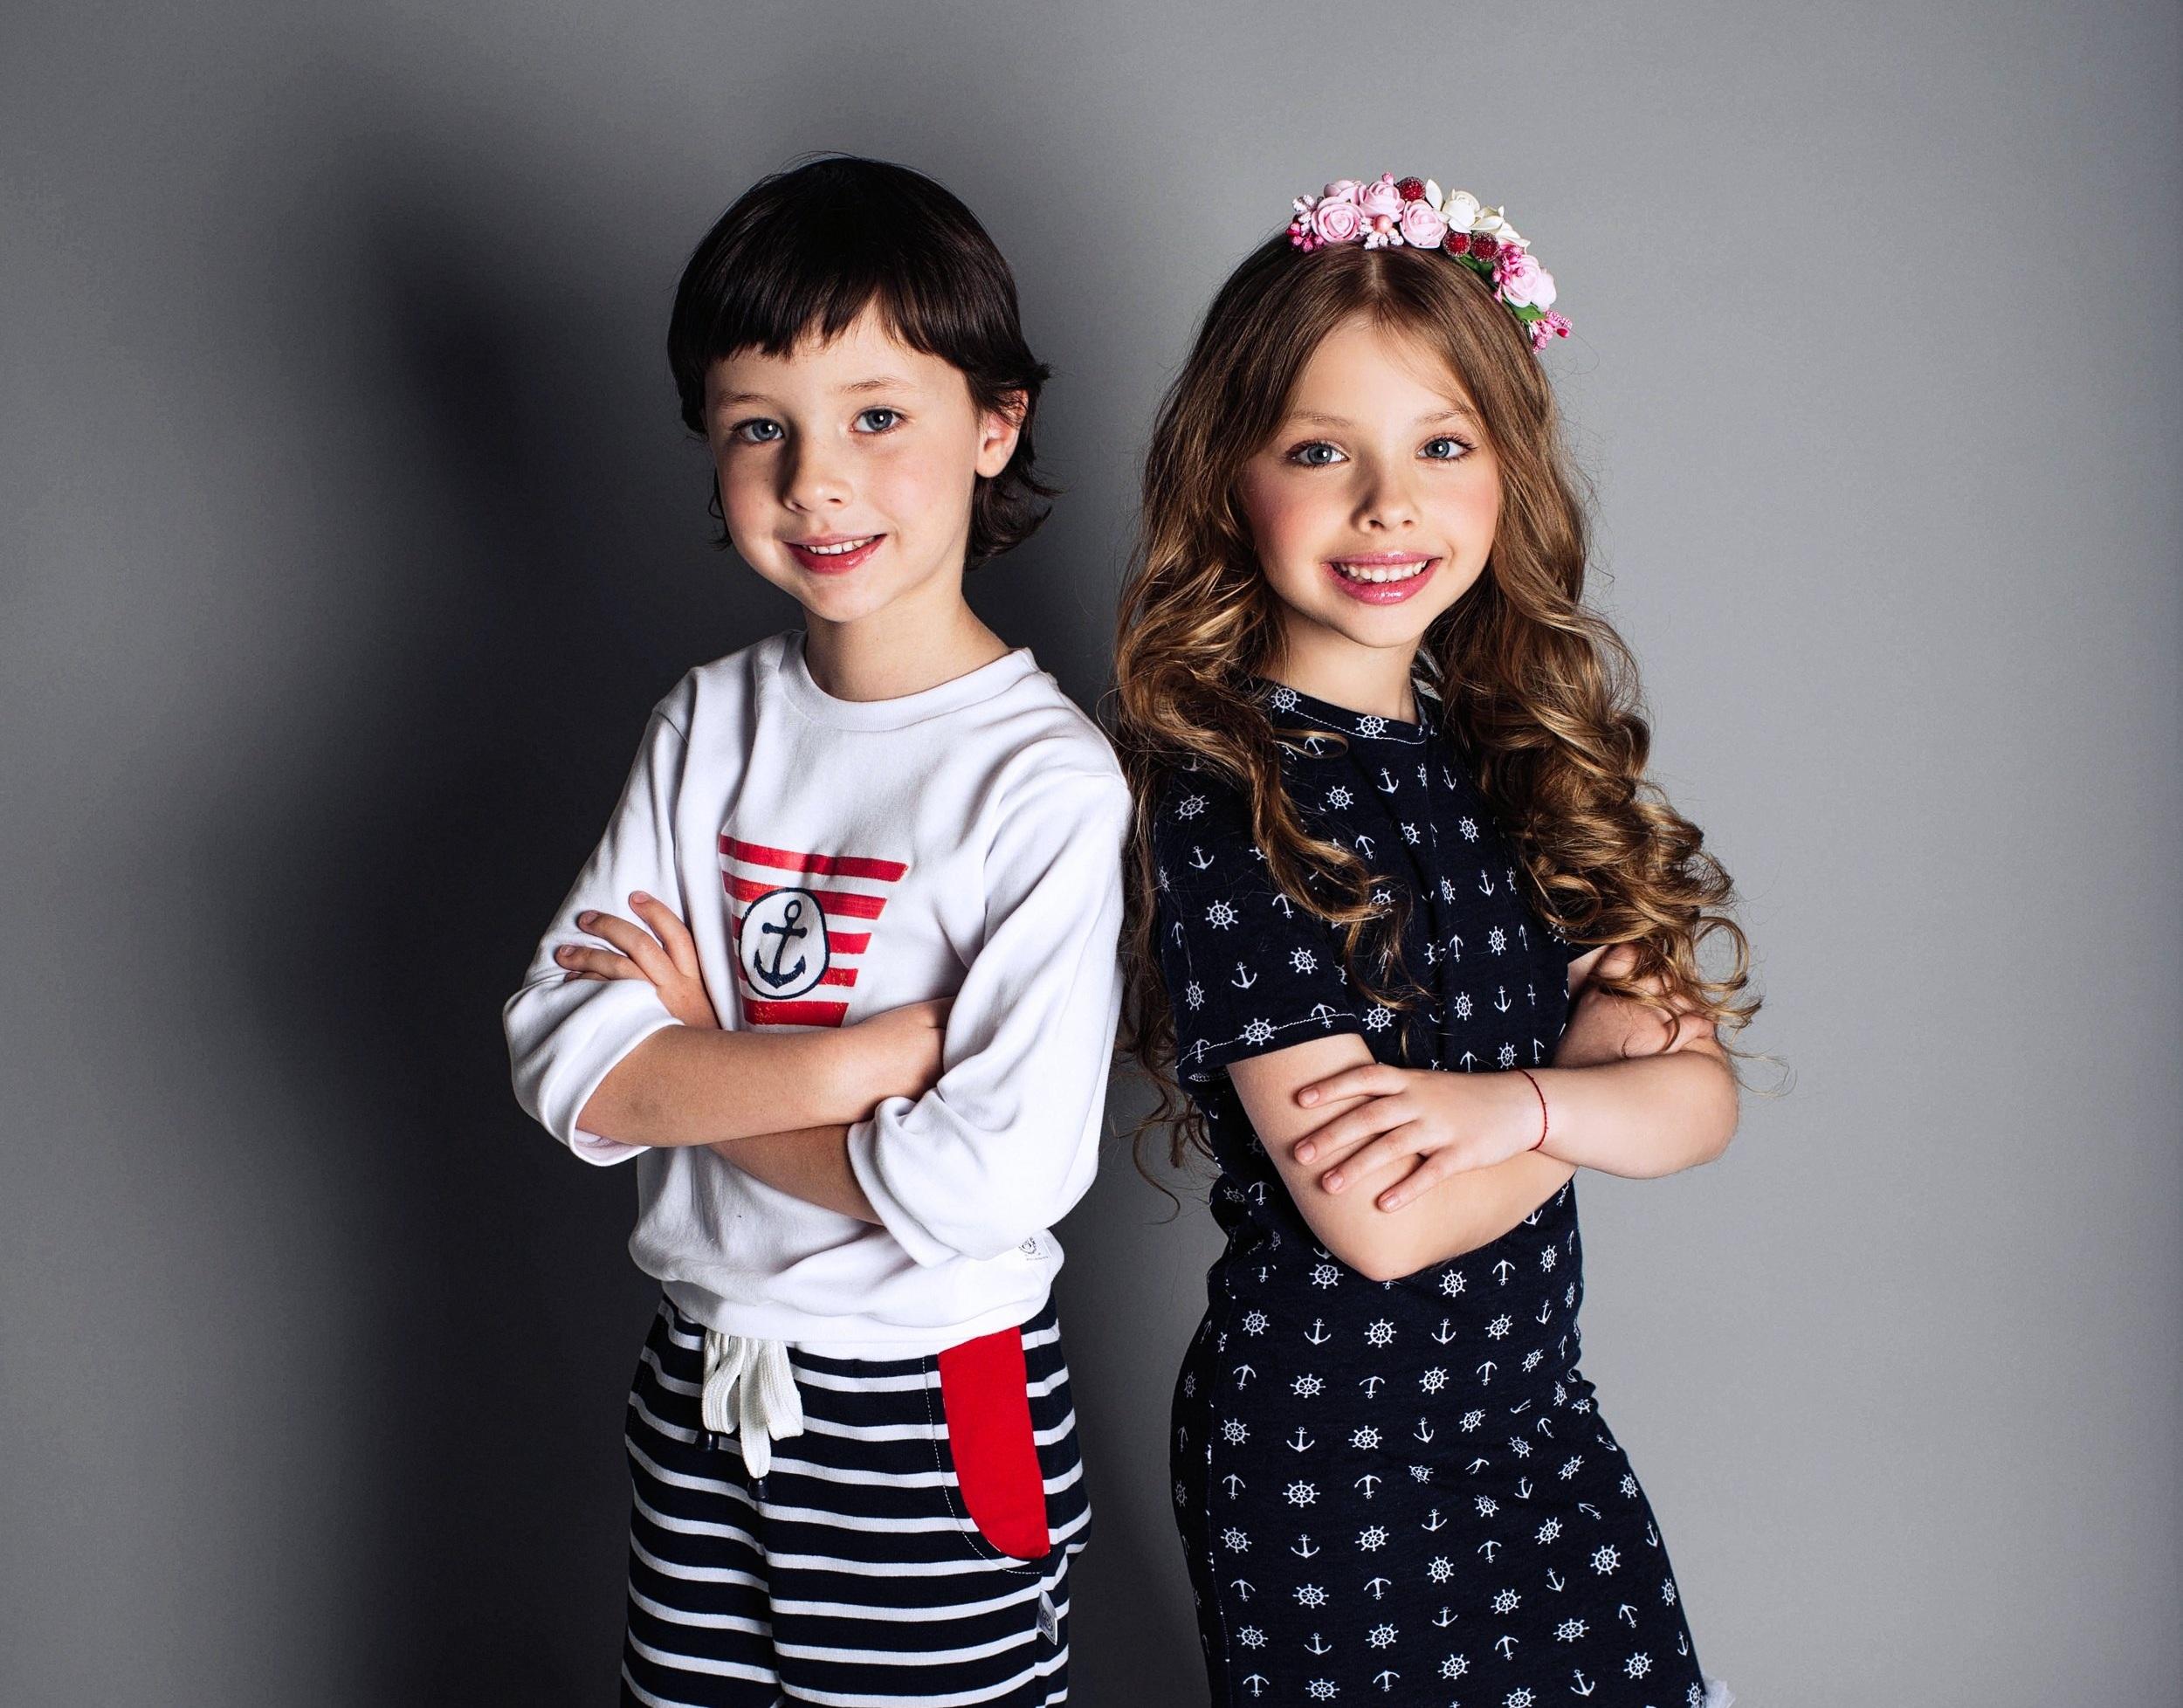 Kids & Infant Photographers